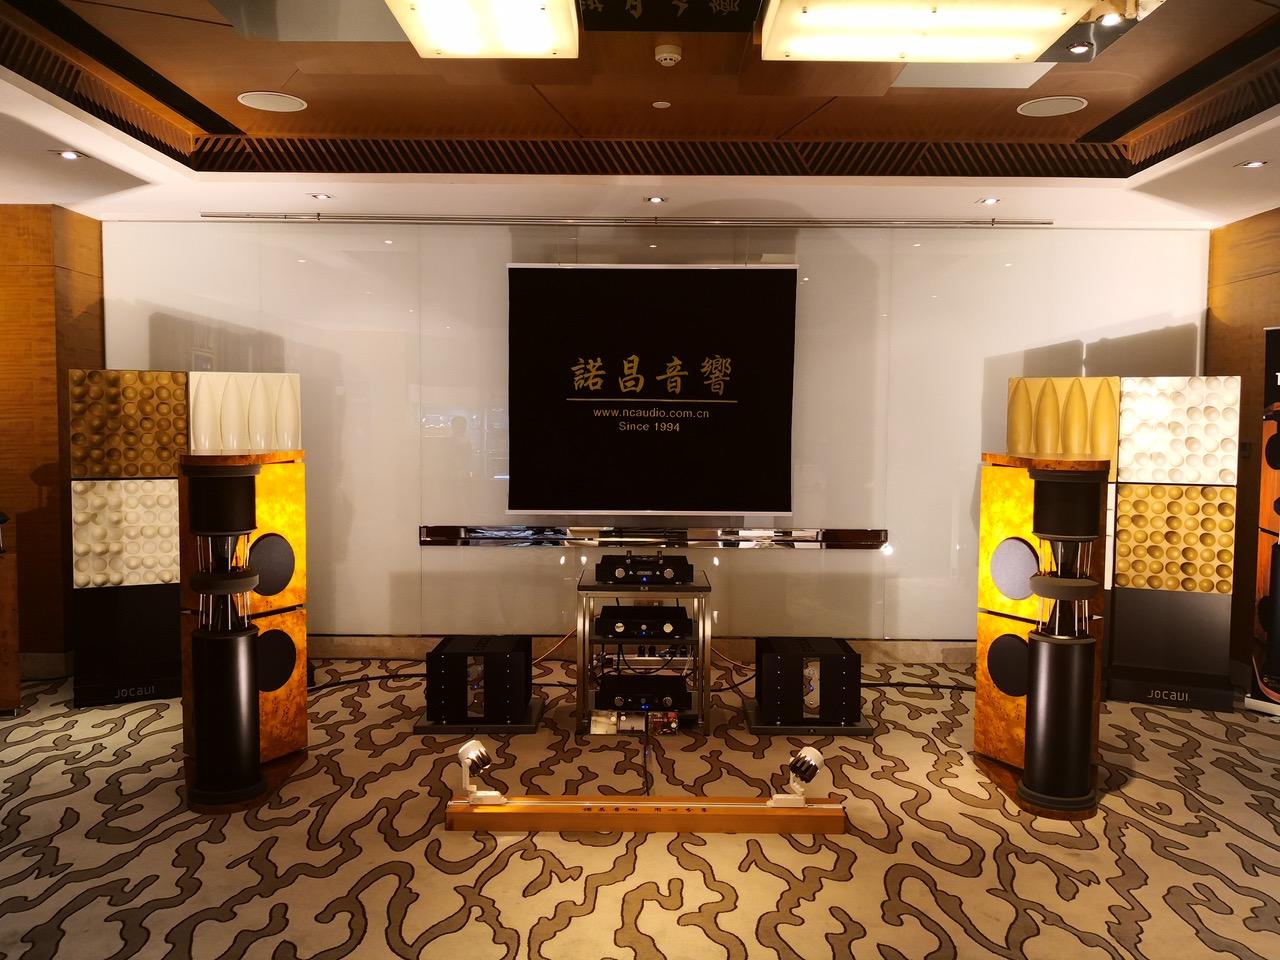 PQS-302 loudspeakers | Beijing Show 2018, China